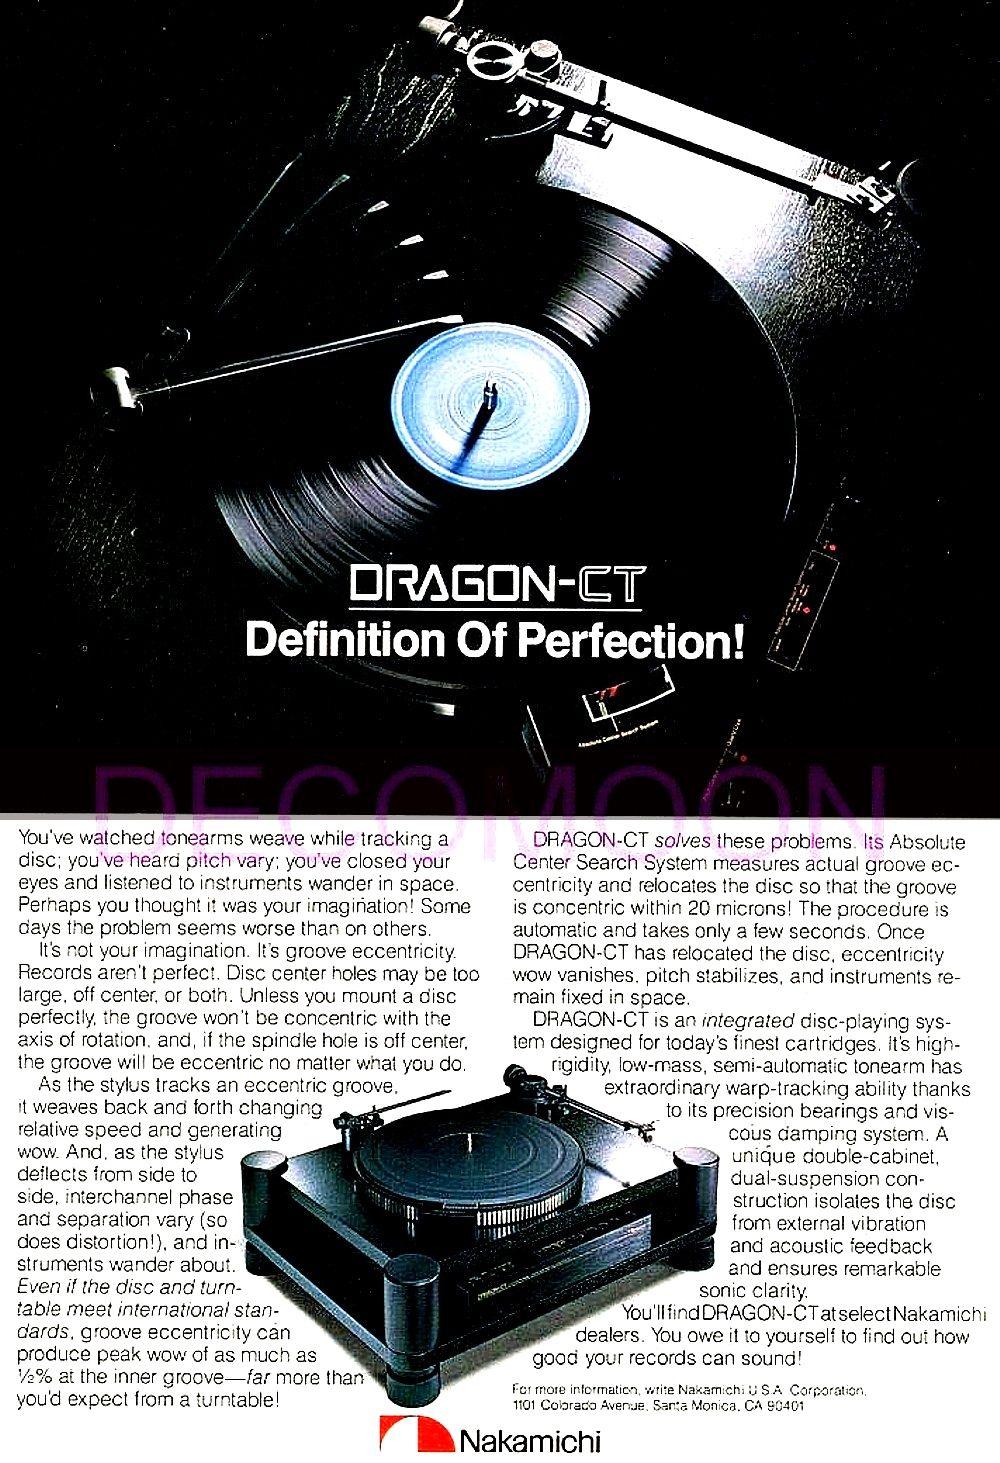 AllegroSound * Nakamichi Dragon-CT Centering Turntable